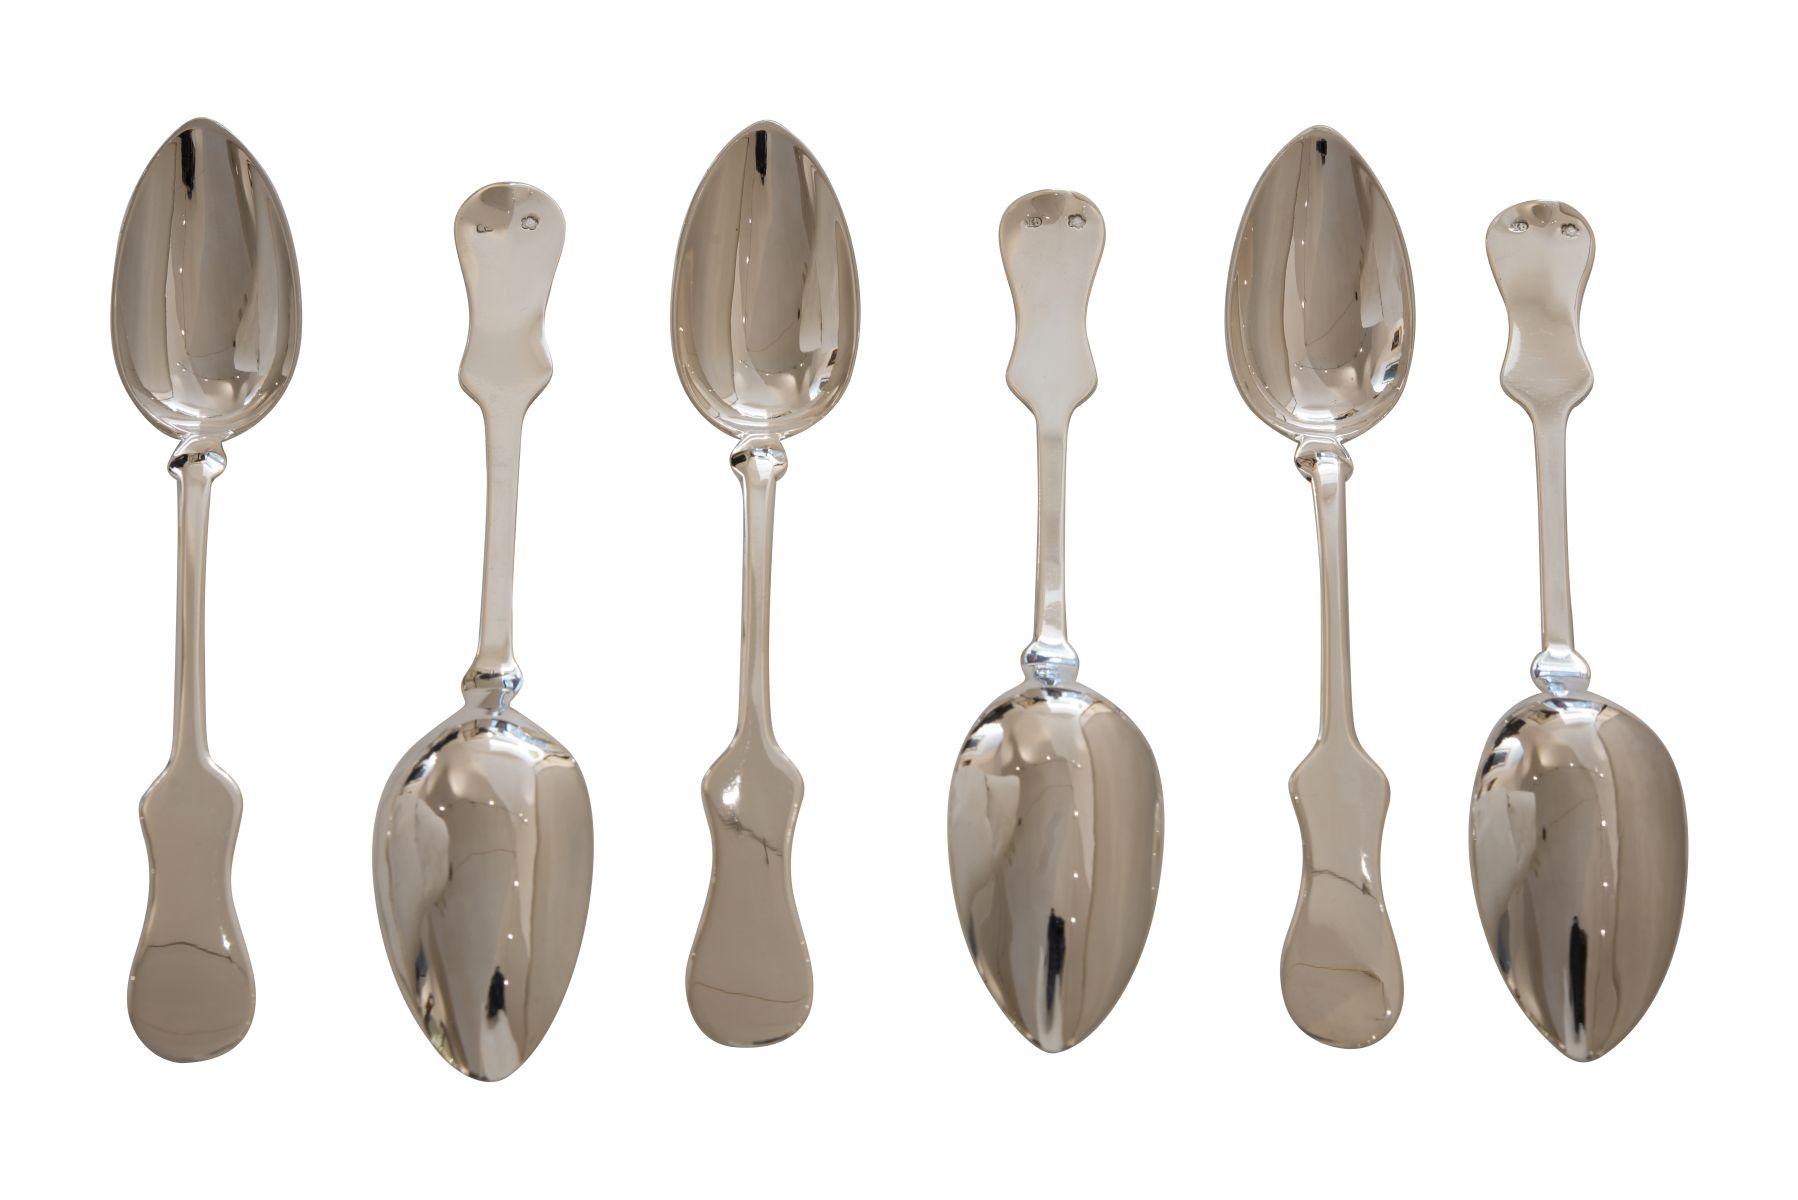 #54 Coffee spoon | 6 Kaffeelöffel Image